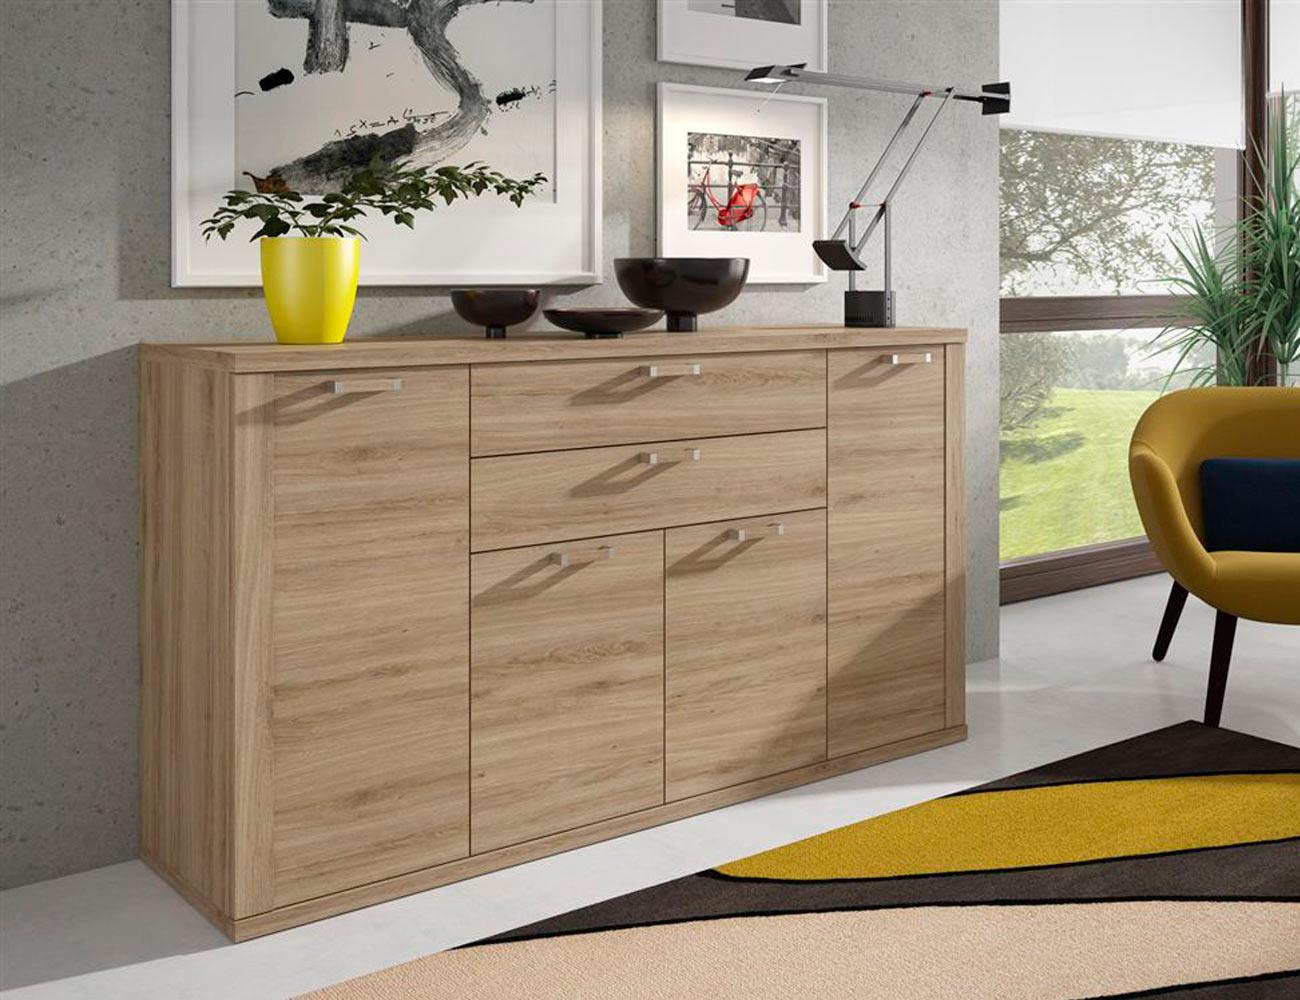 Mueble de sal n comedor estilo moderno color roble natural for Muebles salon color roble